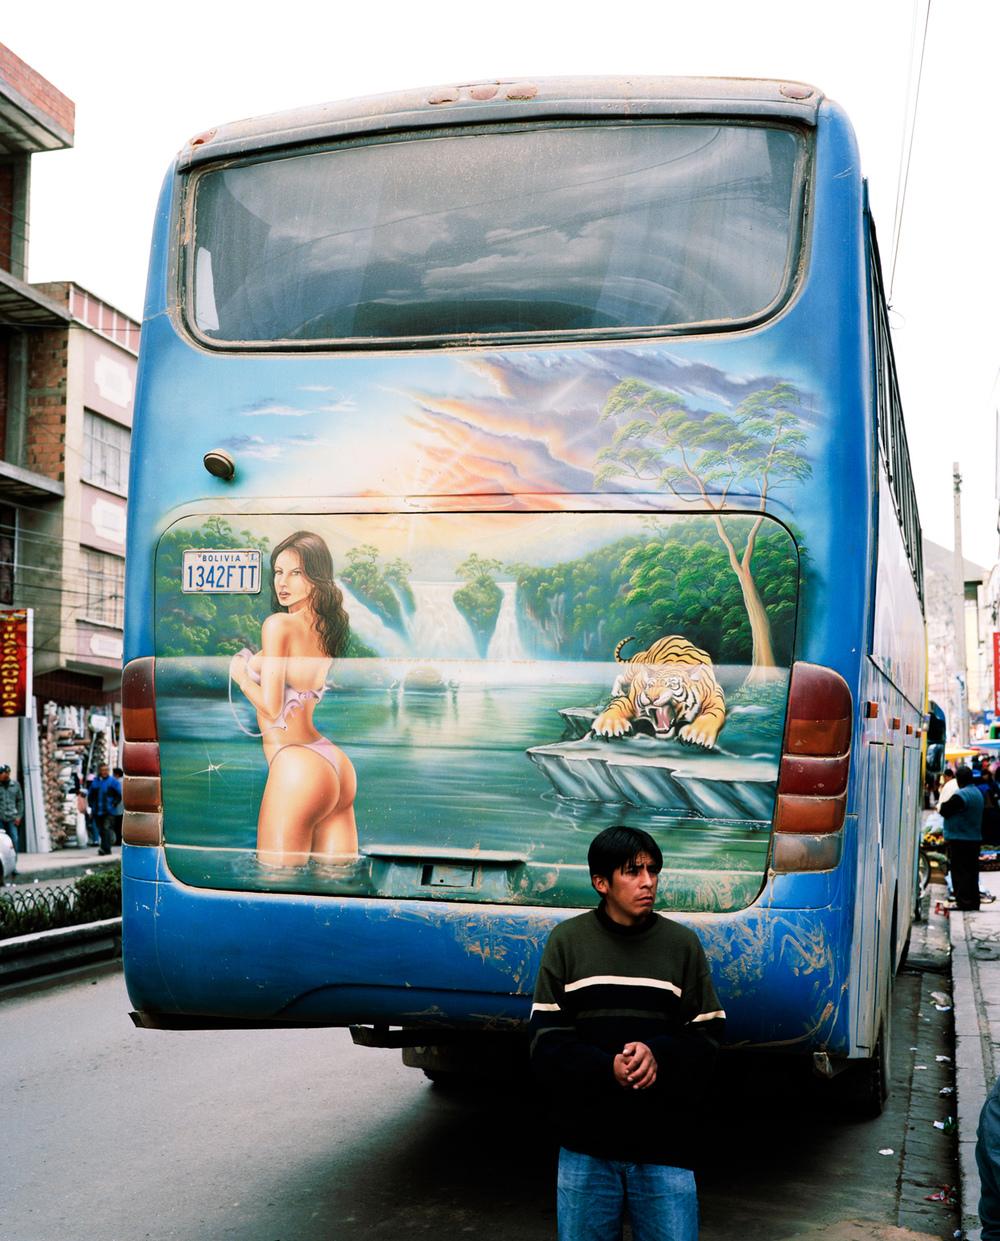 Daniel_Hofer_Bolivian_Busses_195_08_1550PX_WEB.jpg